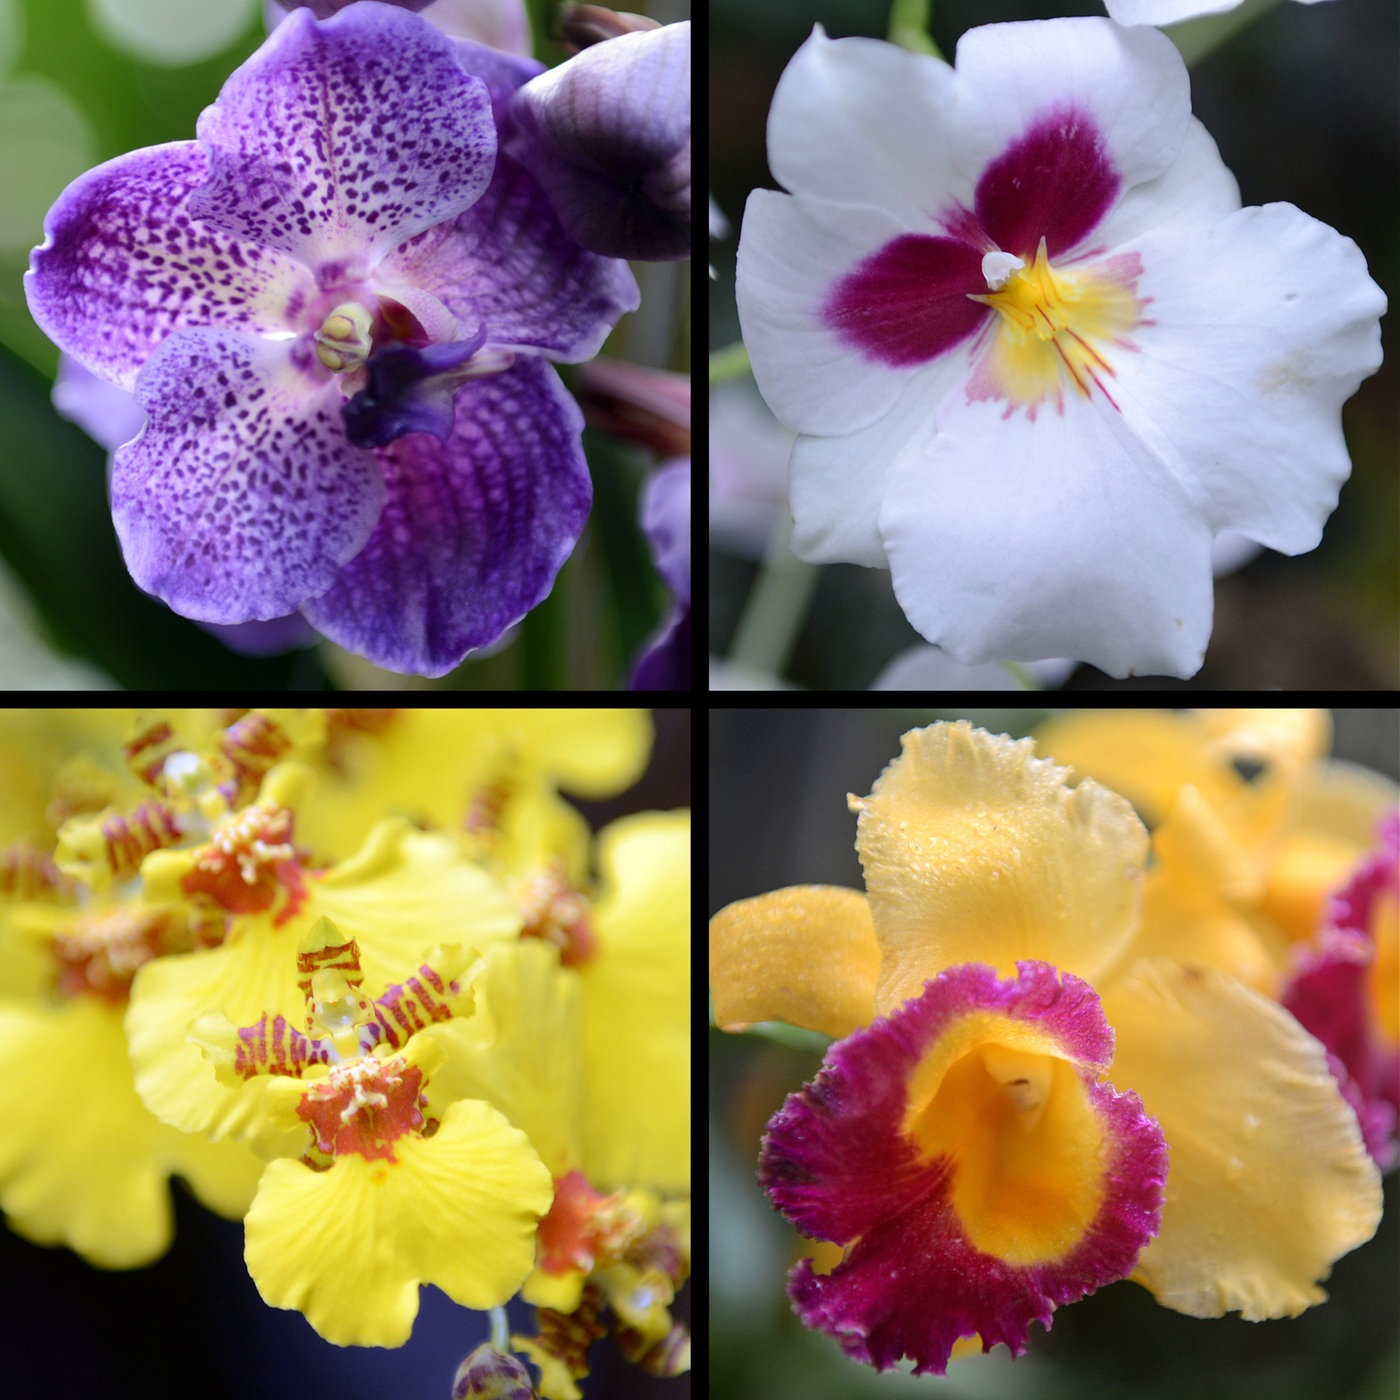 Orchidee klebt